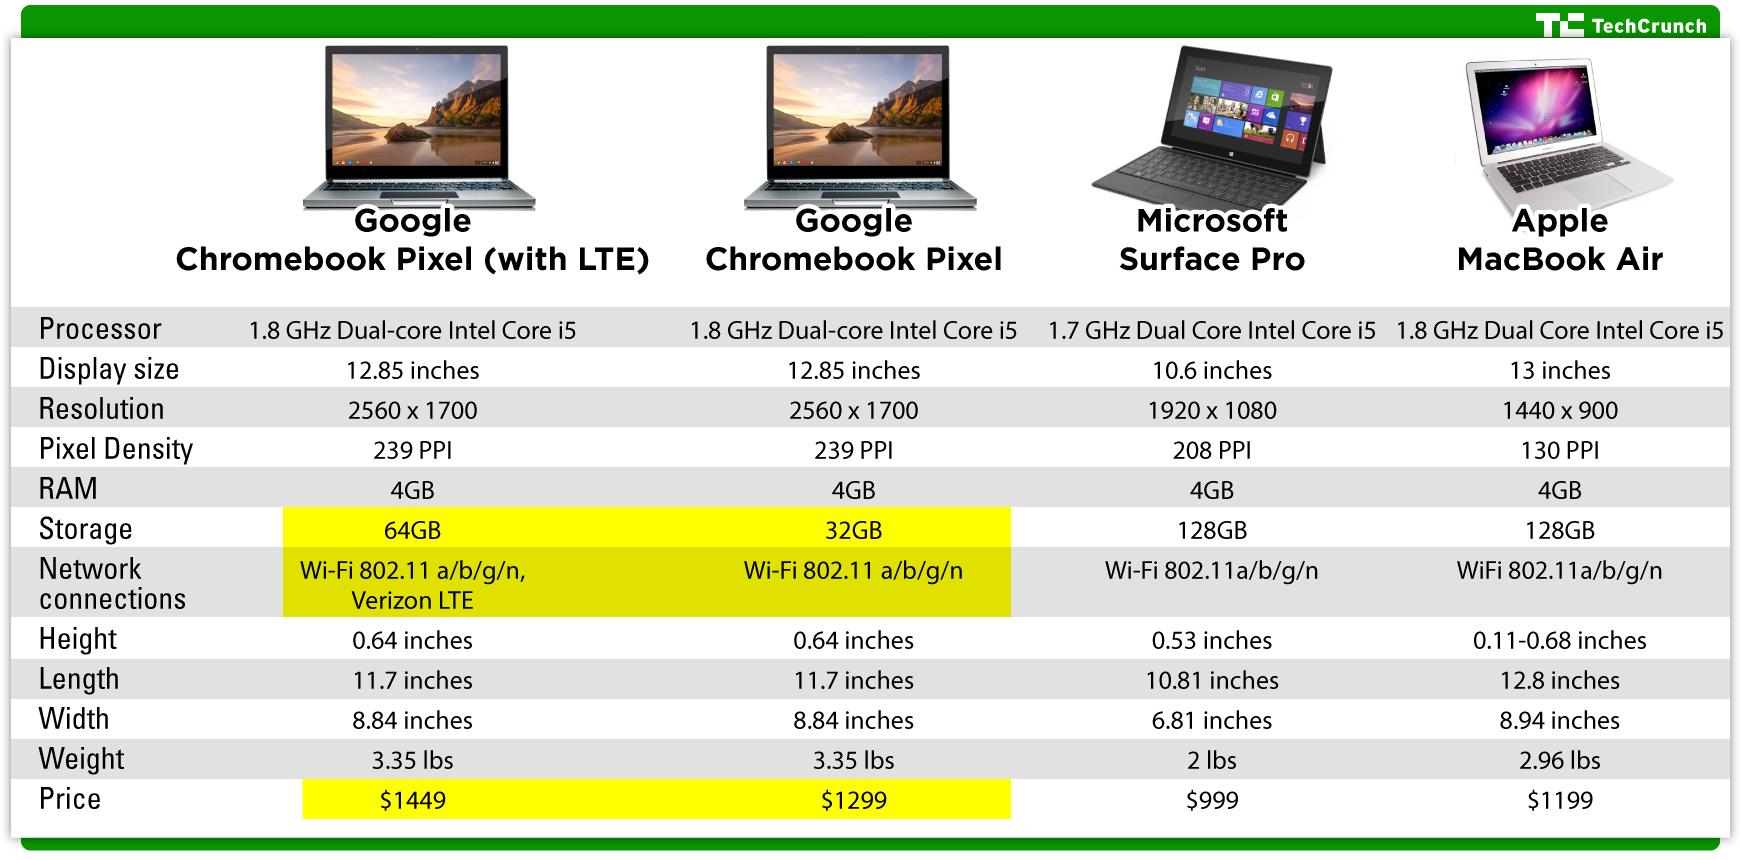 Google Chromebook Pixel comparison